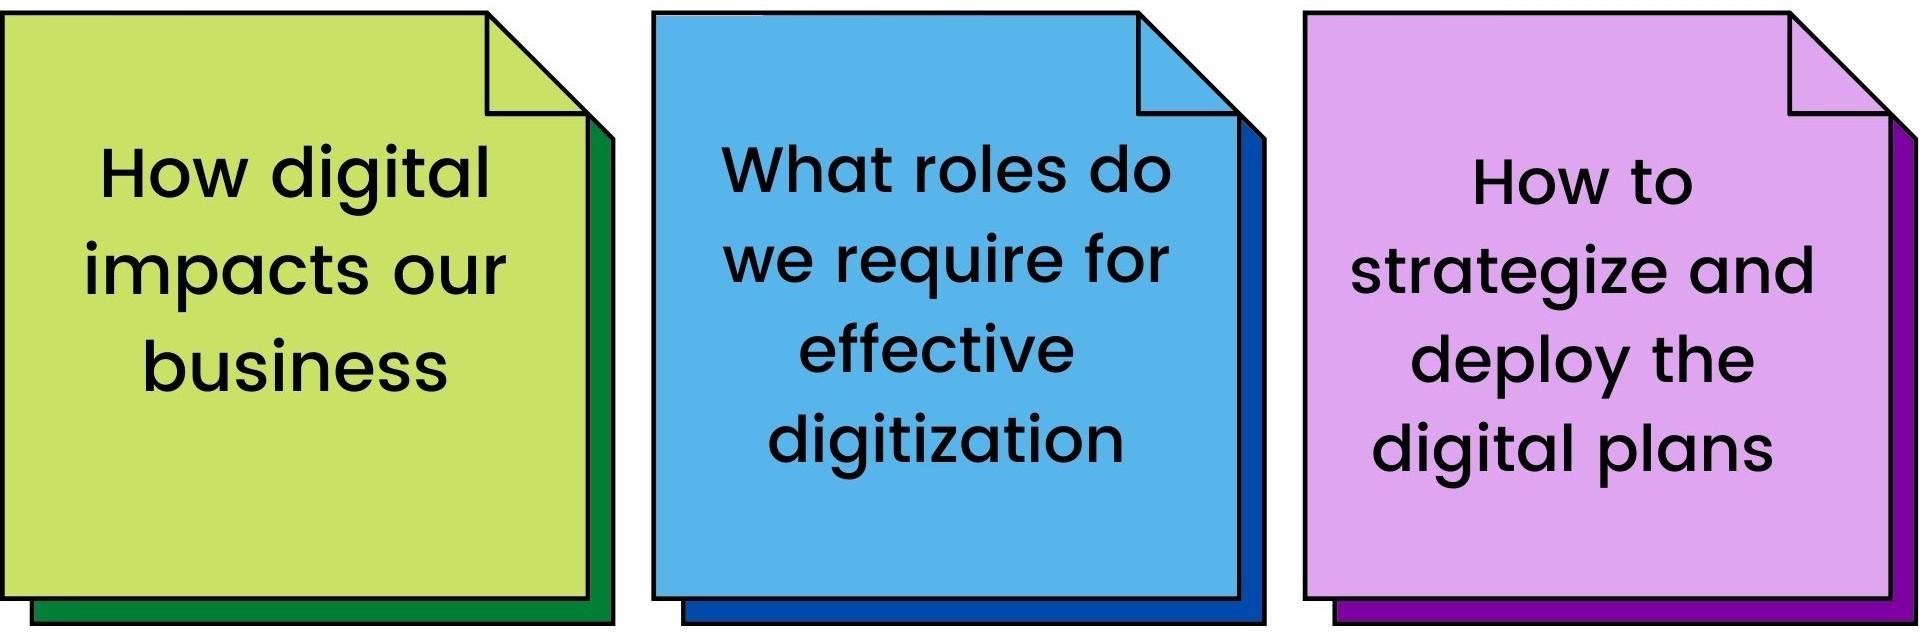 Digital transformation questions